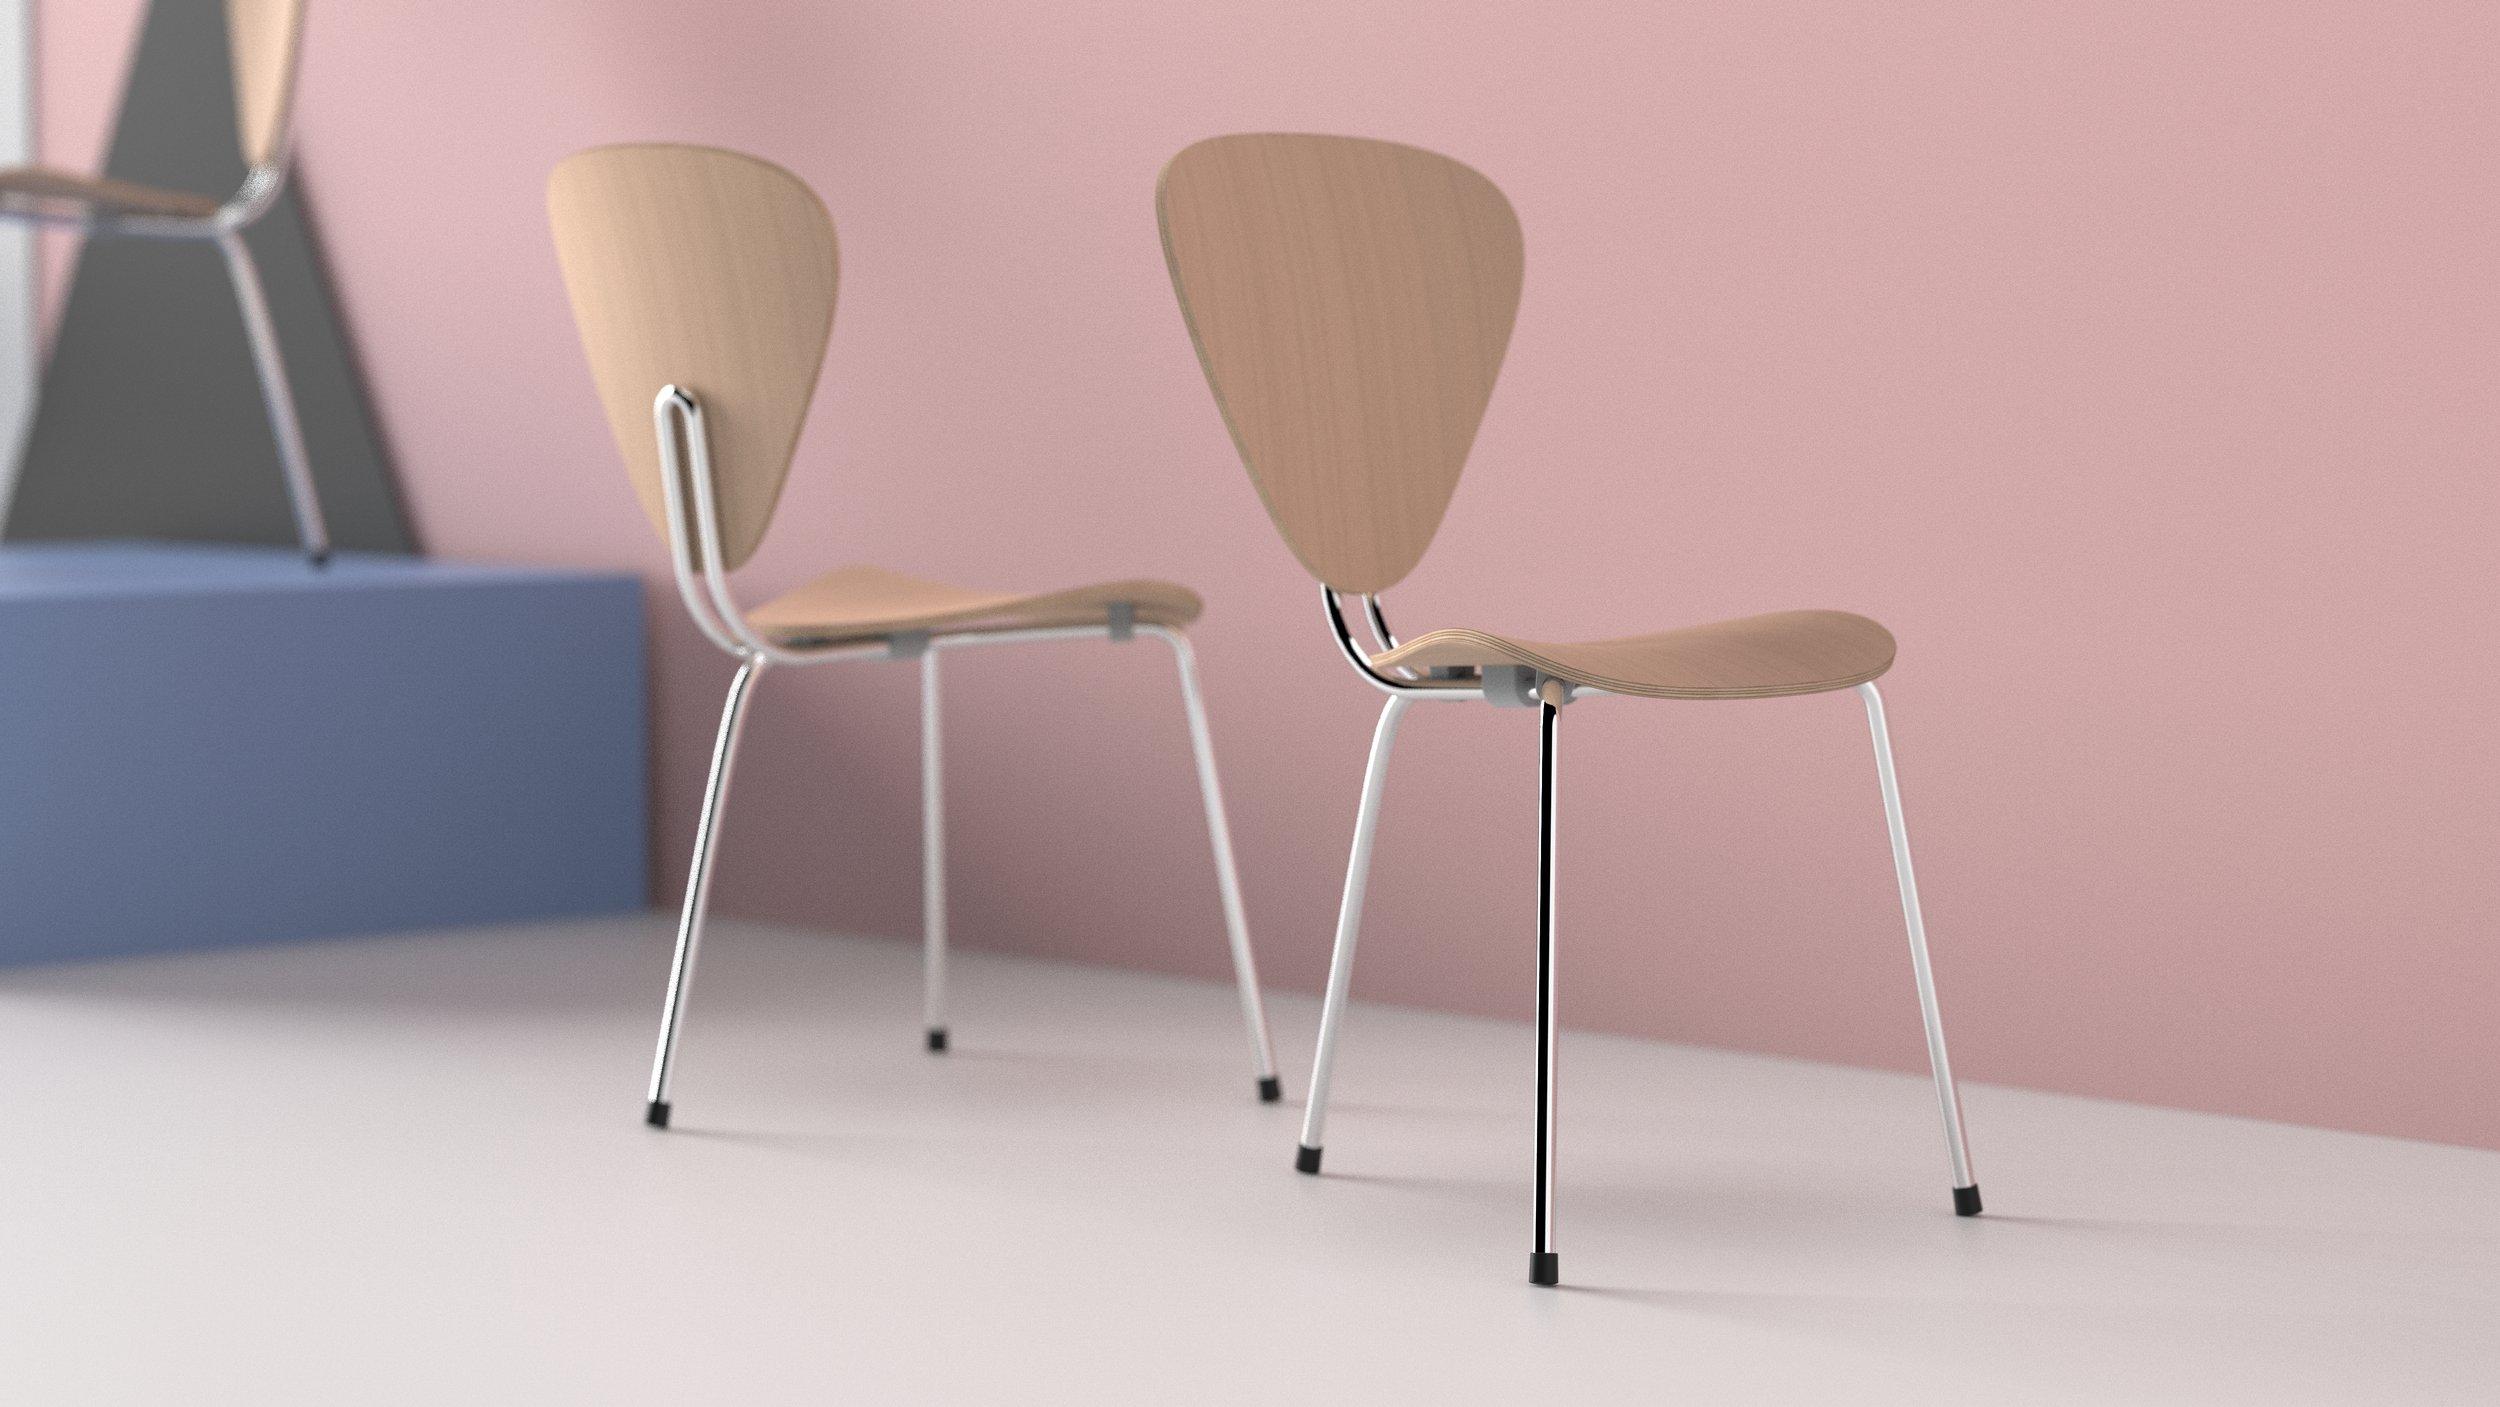 chair concha fondo dos.90fi.91.jpg